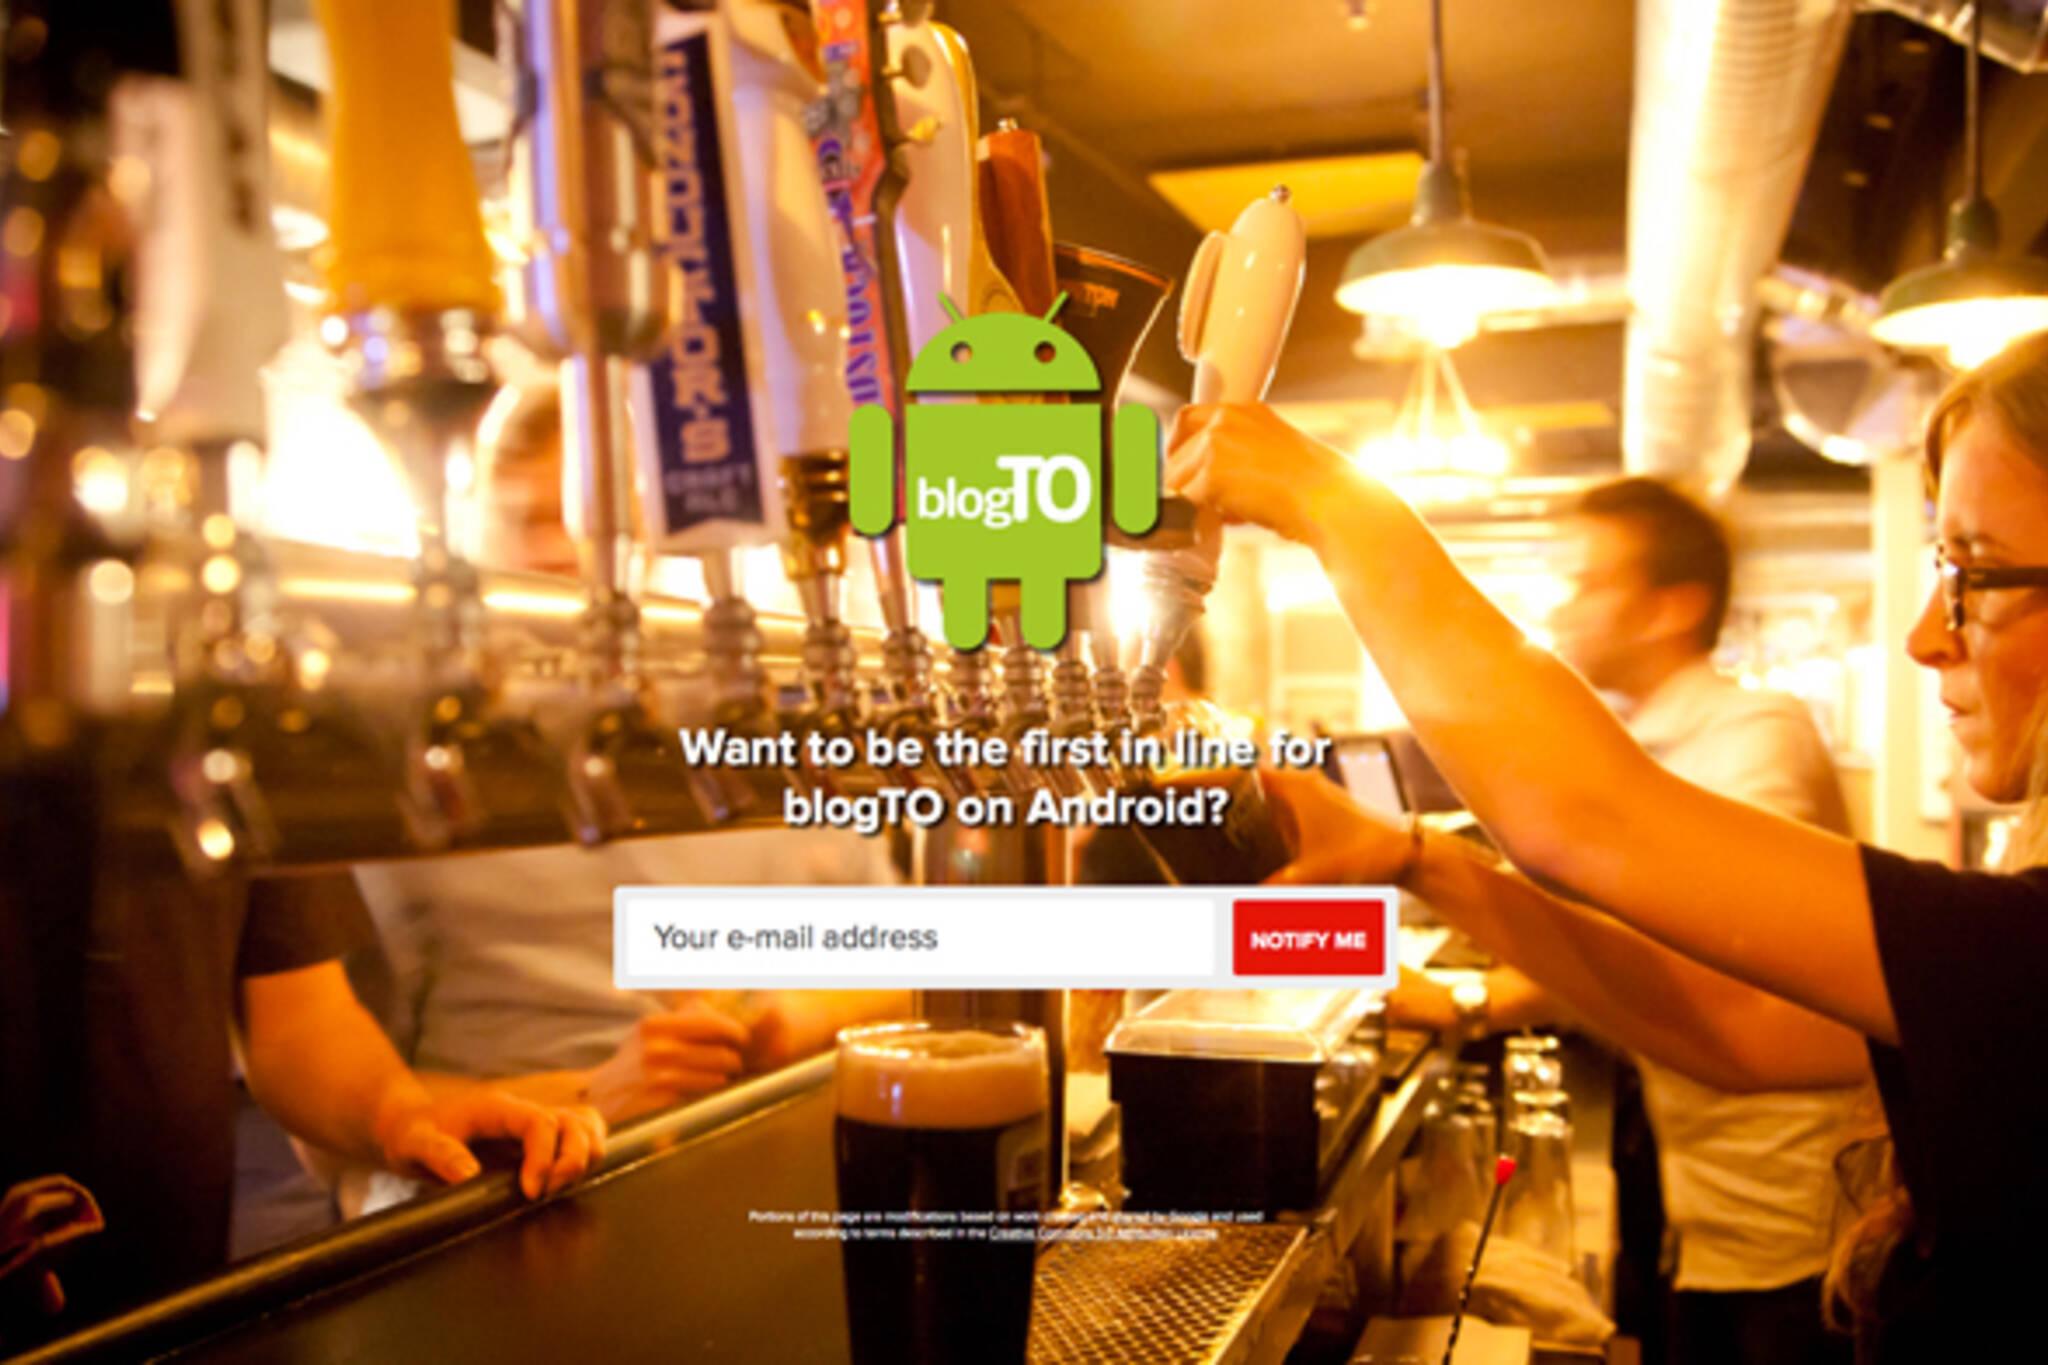 toronto Android app